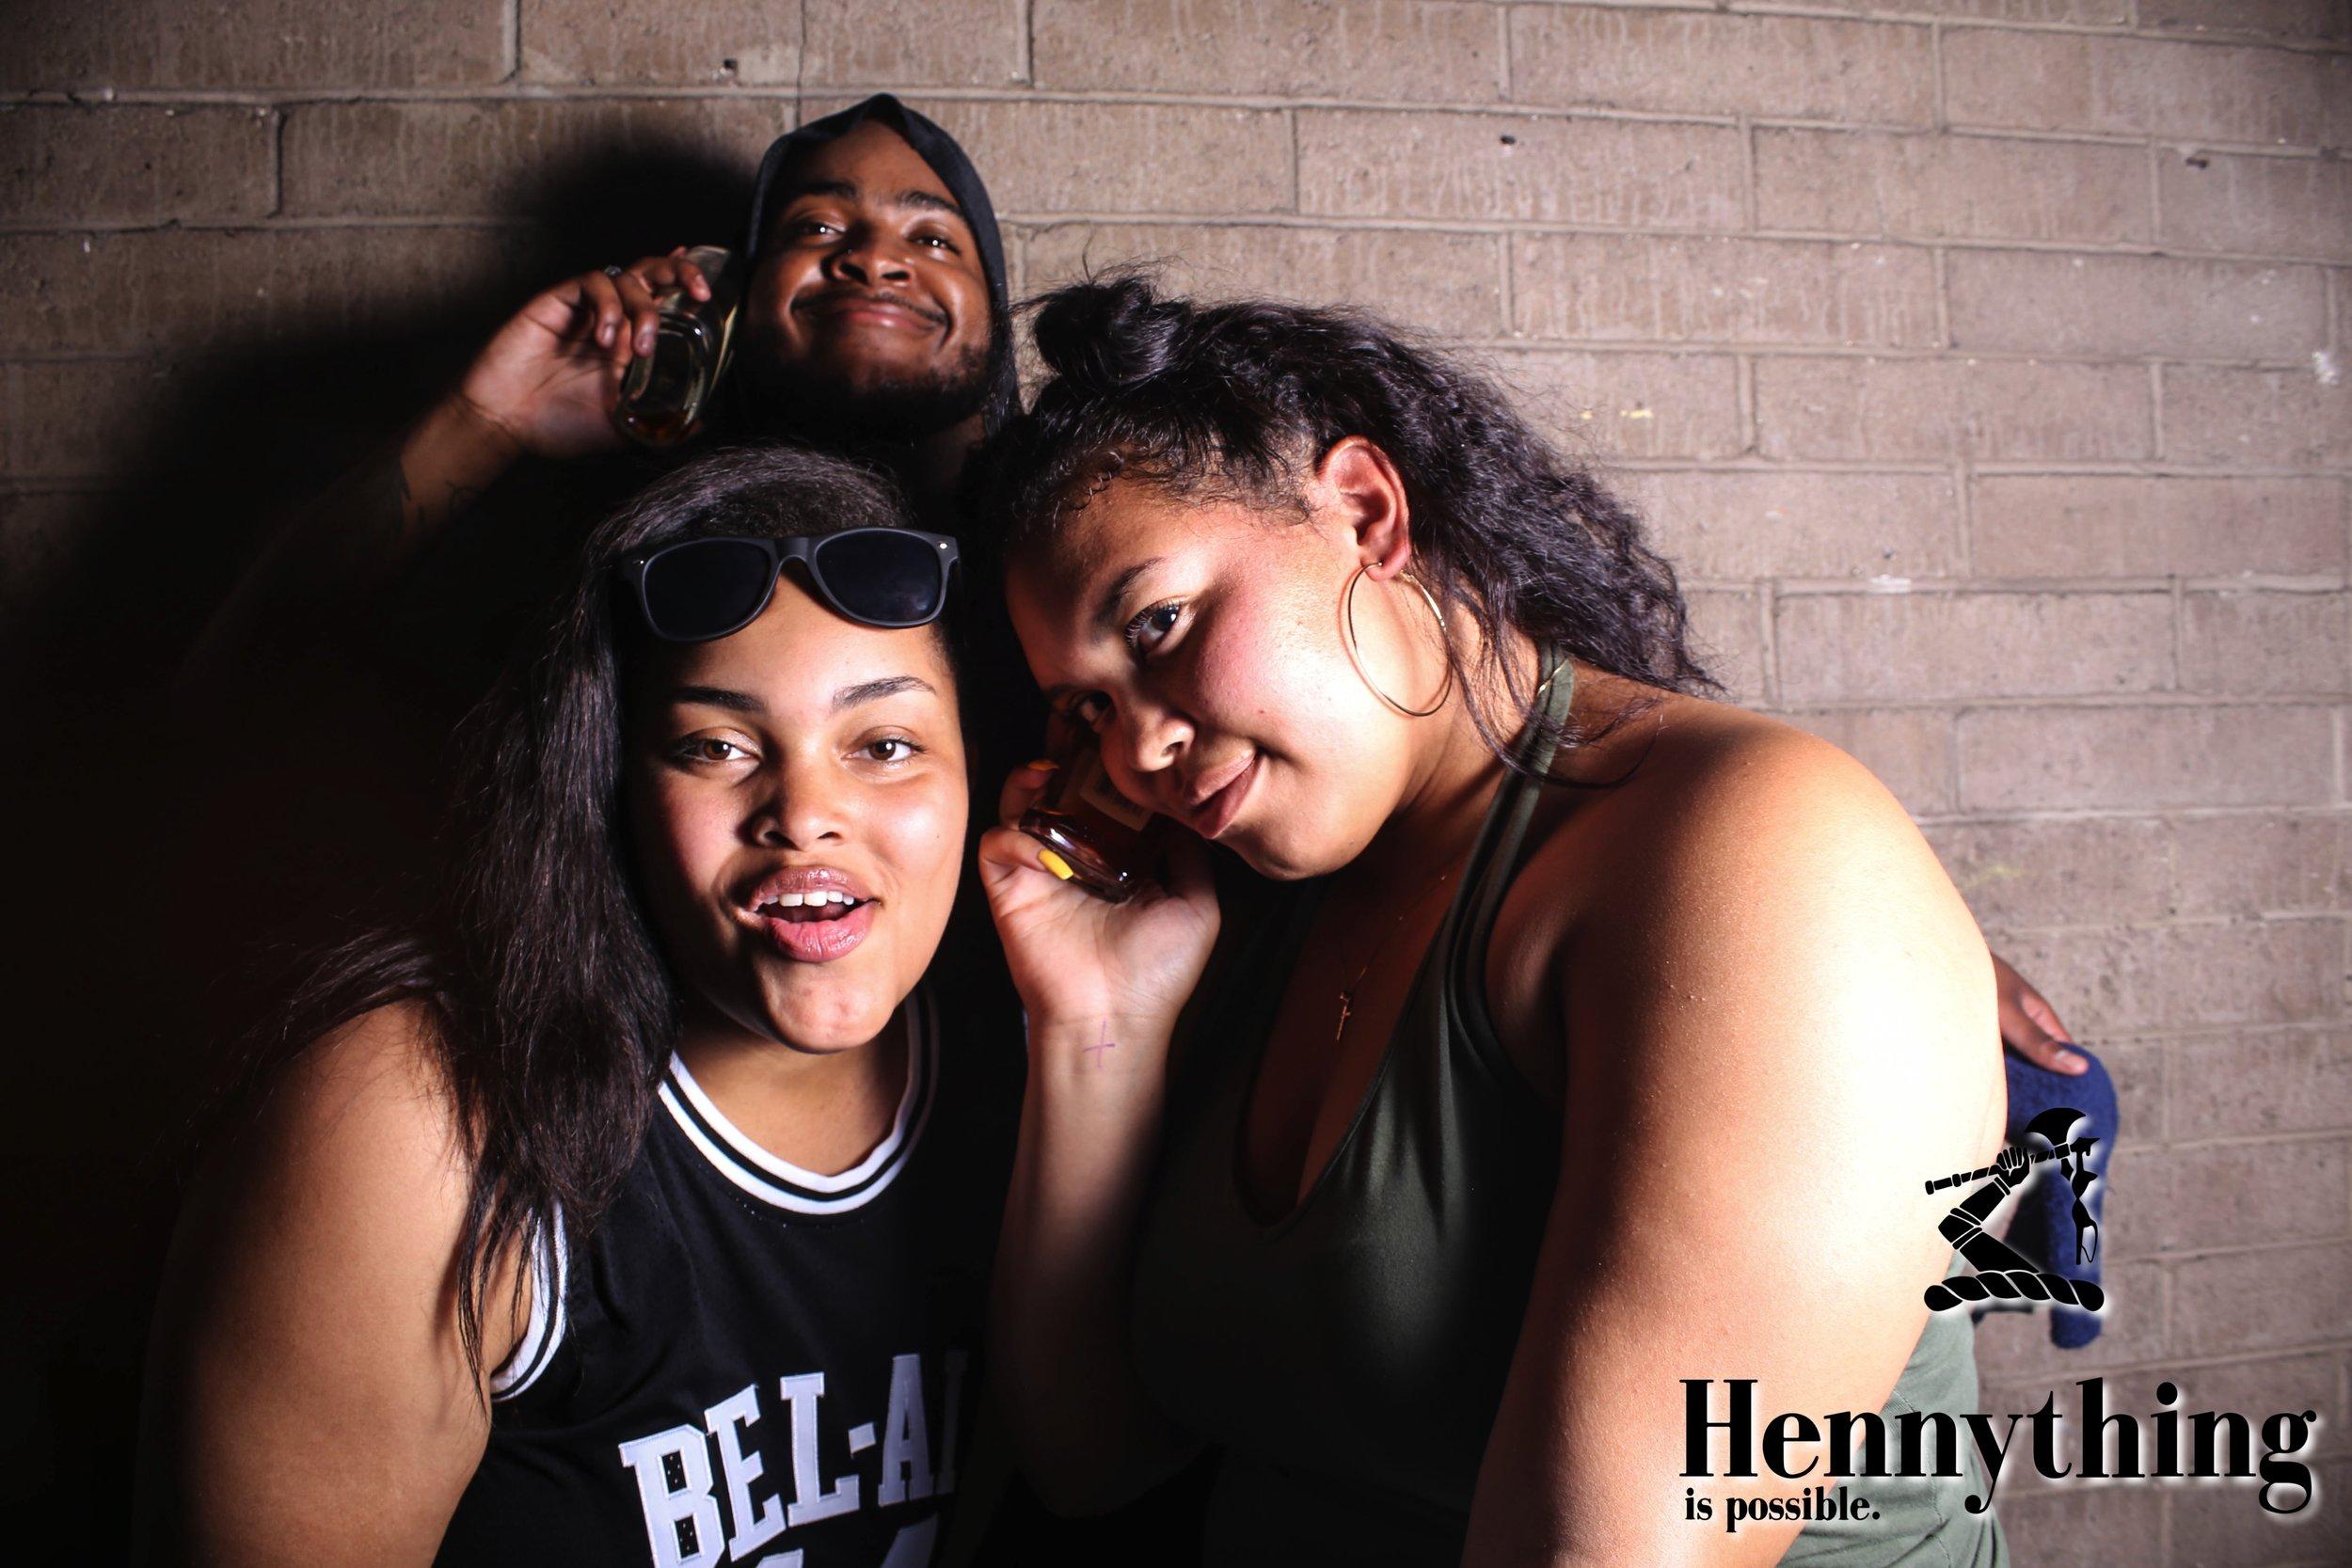 HennyThingIsPossible-058.jpg